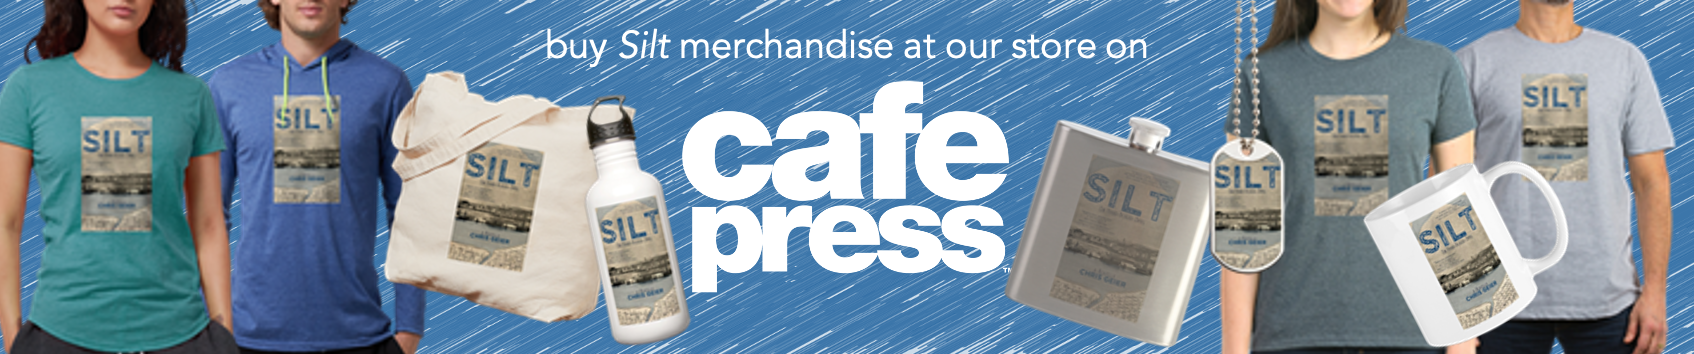 Buy Silt merchandise at Cafe Press